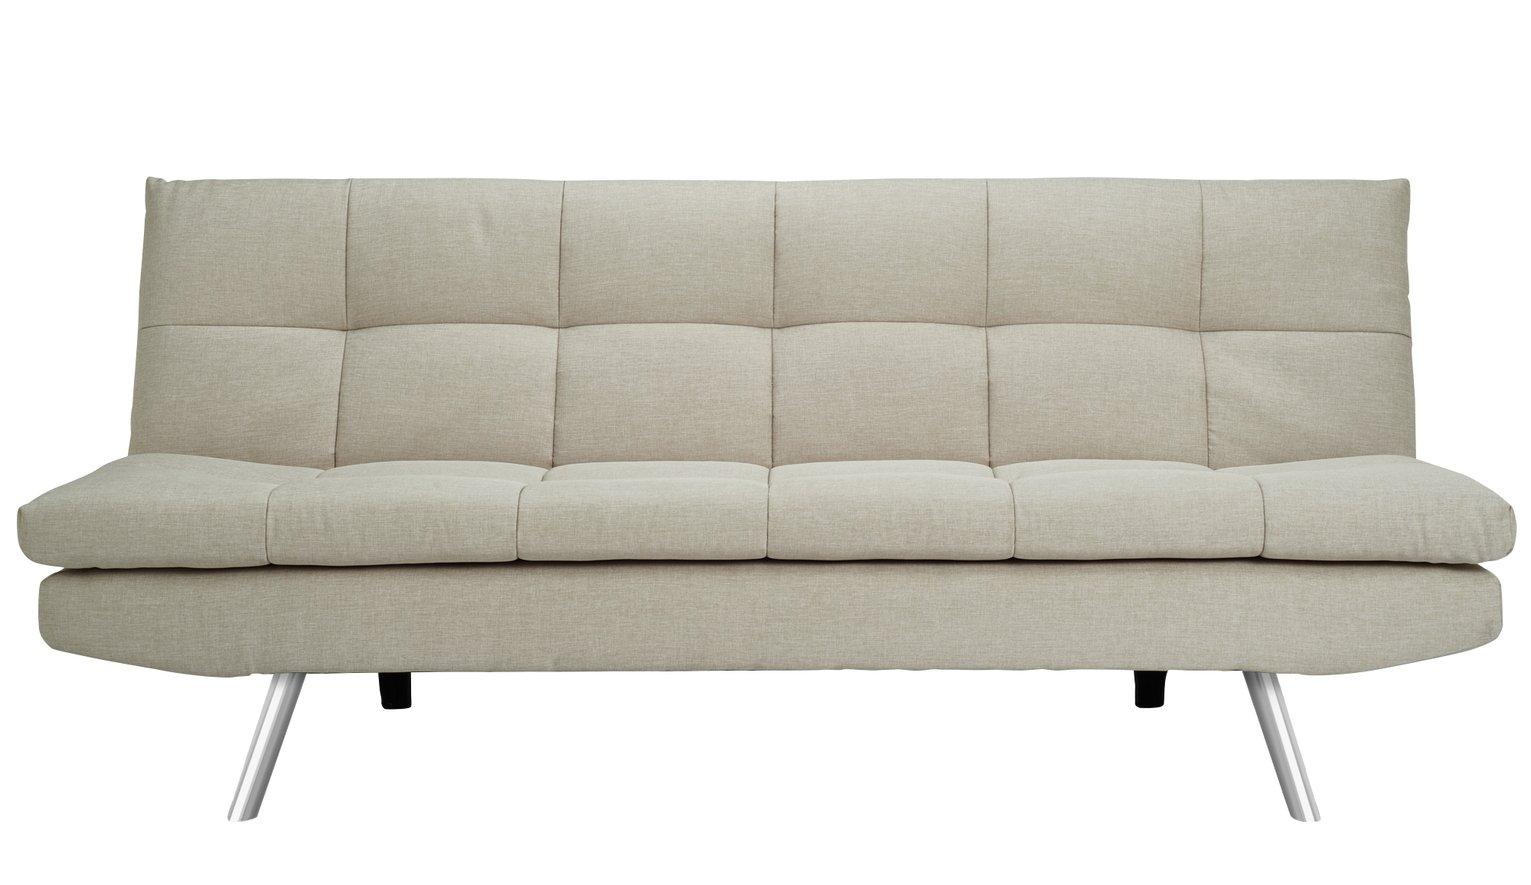 Buy Argos Home Nolan 3 Seater Fabric Sofa Bed - Natural   Sofa beds